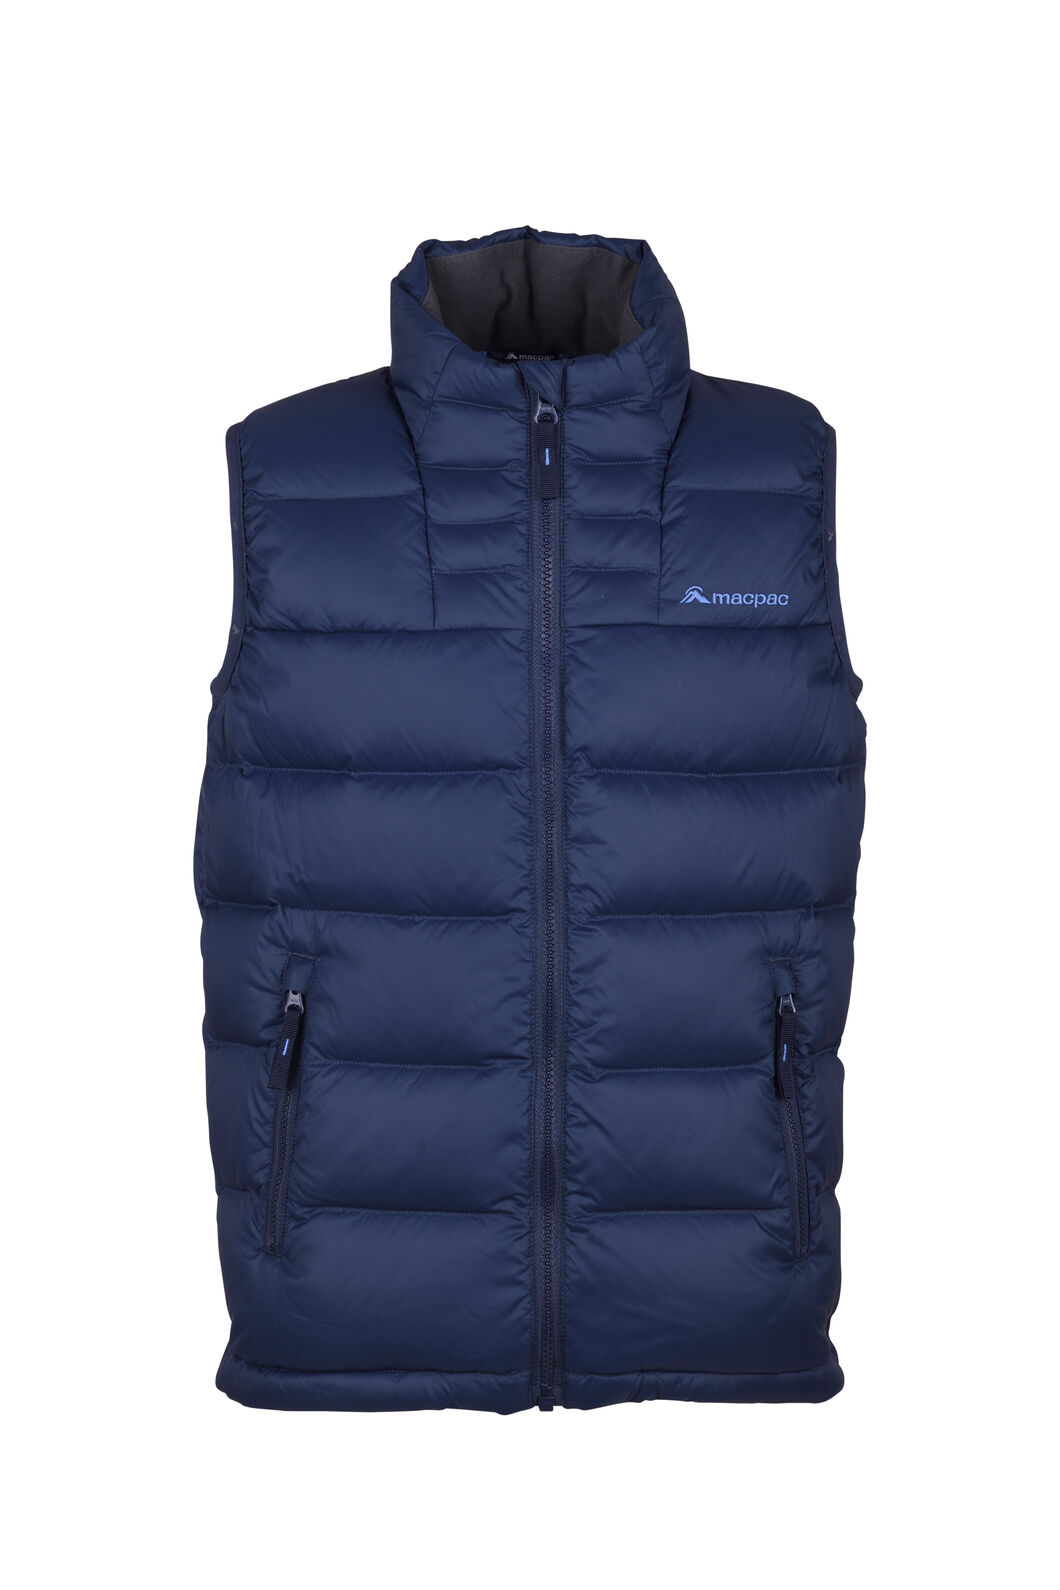 Macpac Atom Down Vest — Kids', Black Iris, hi-res